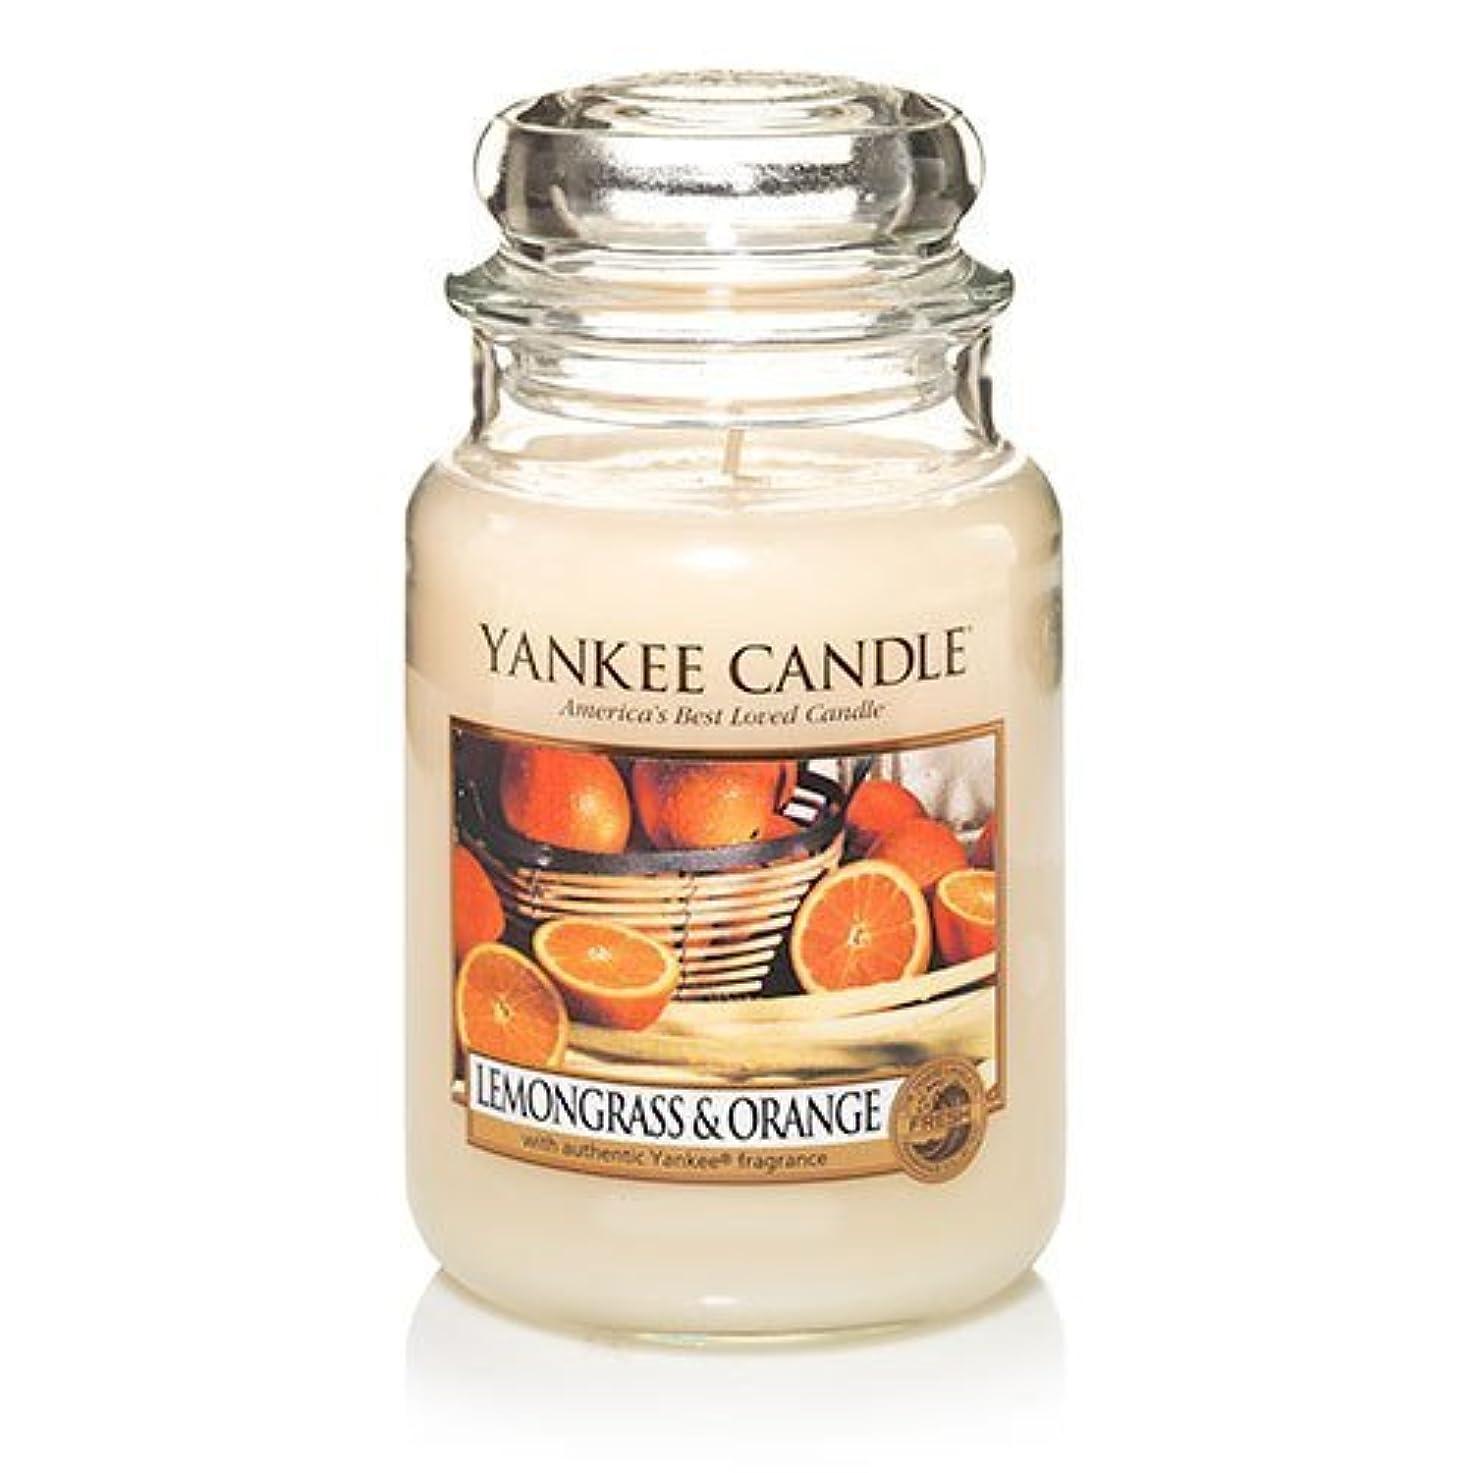 告発者義務重荷Yankee Candle Lemongrass & Orange - 22oz Large Housewarmer Jar by Yankee Candle [並行輸入品]